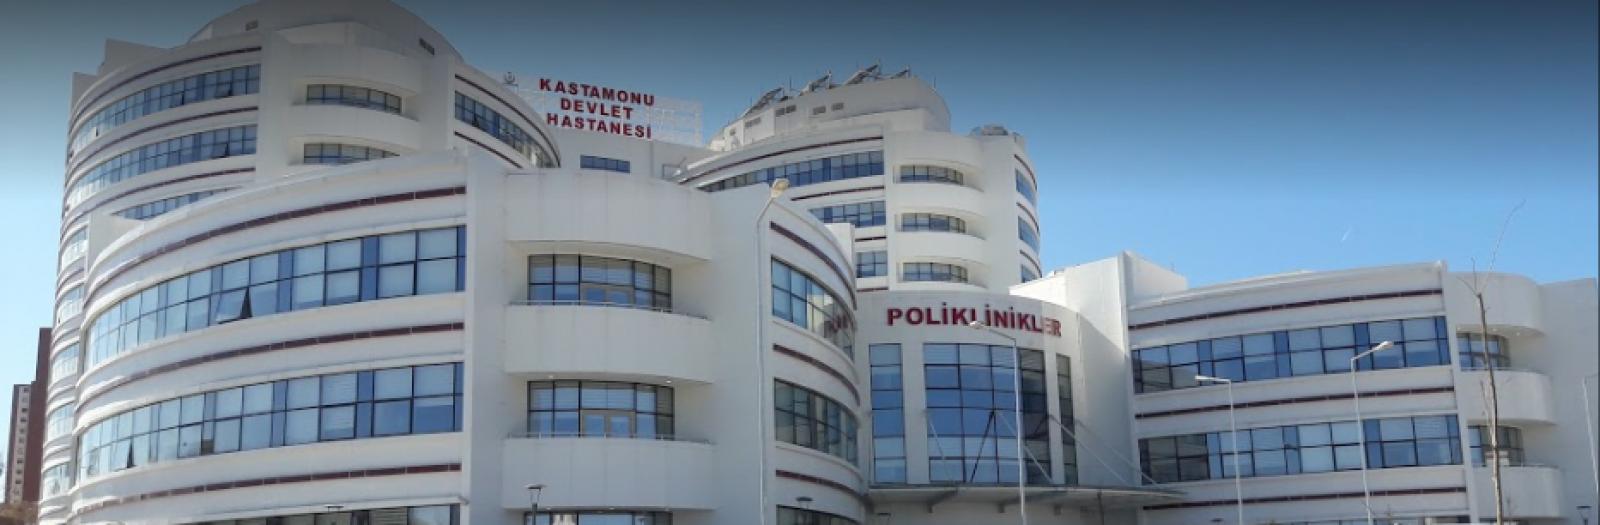 Kastamonu Devlet Hastanesi